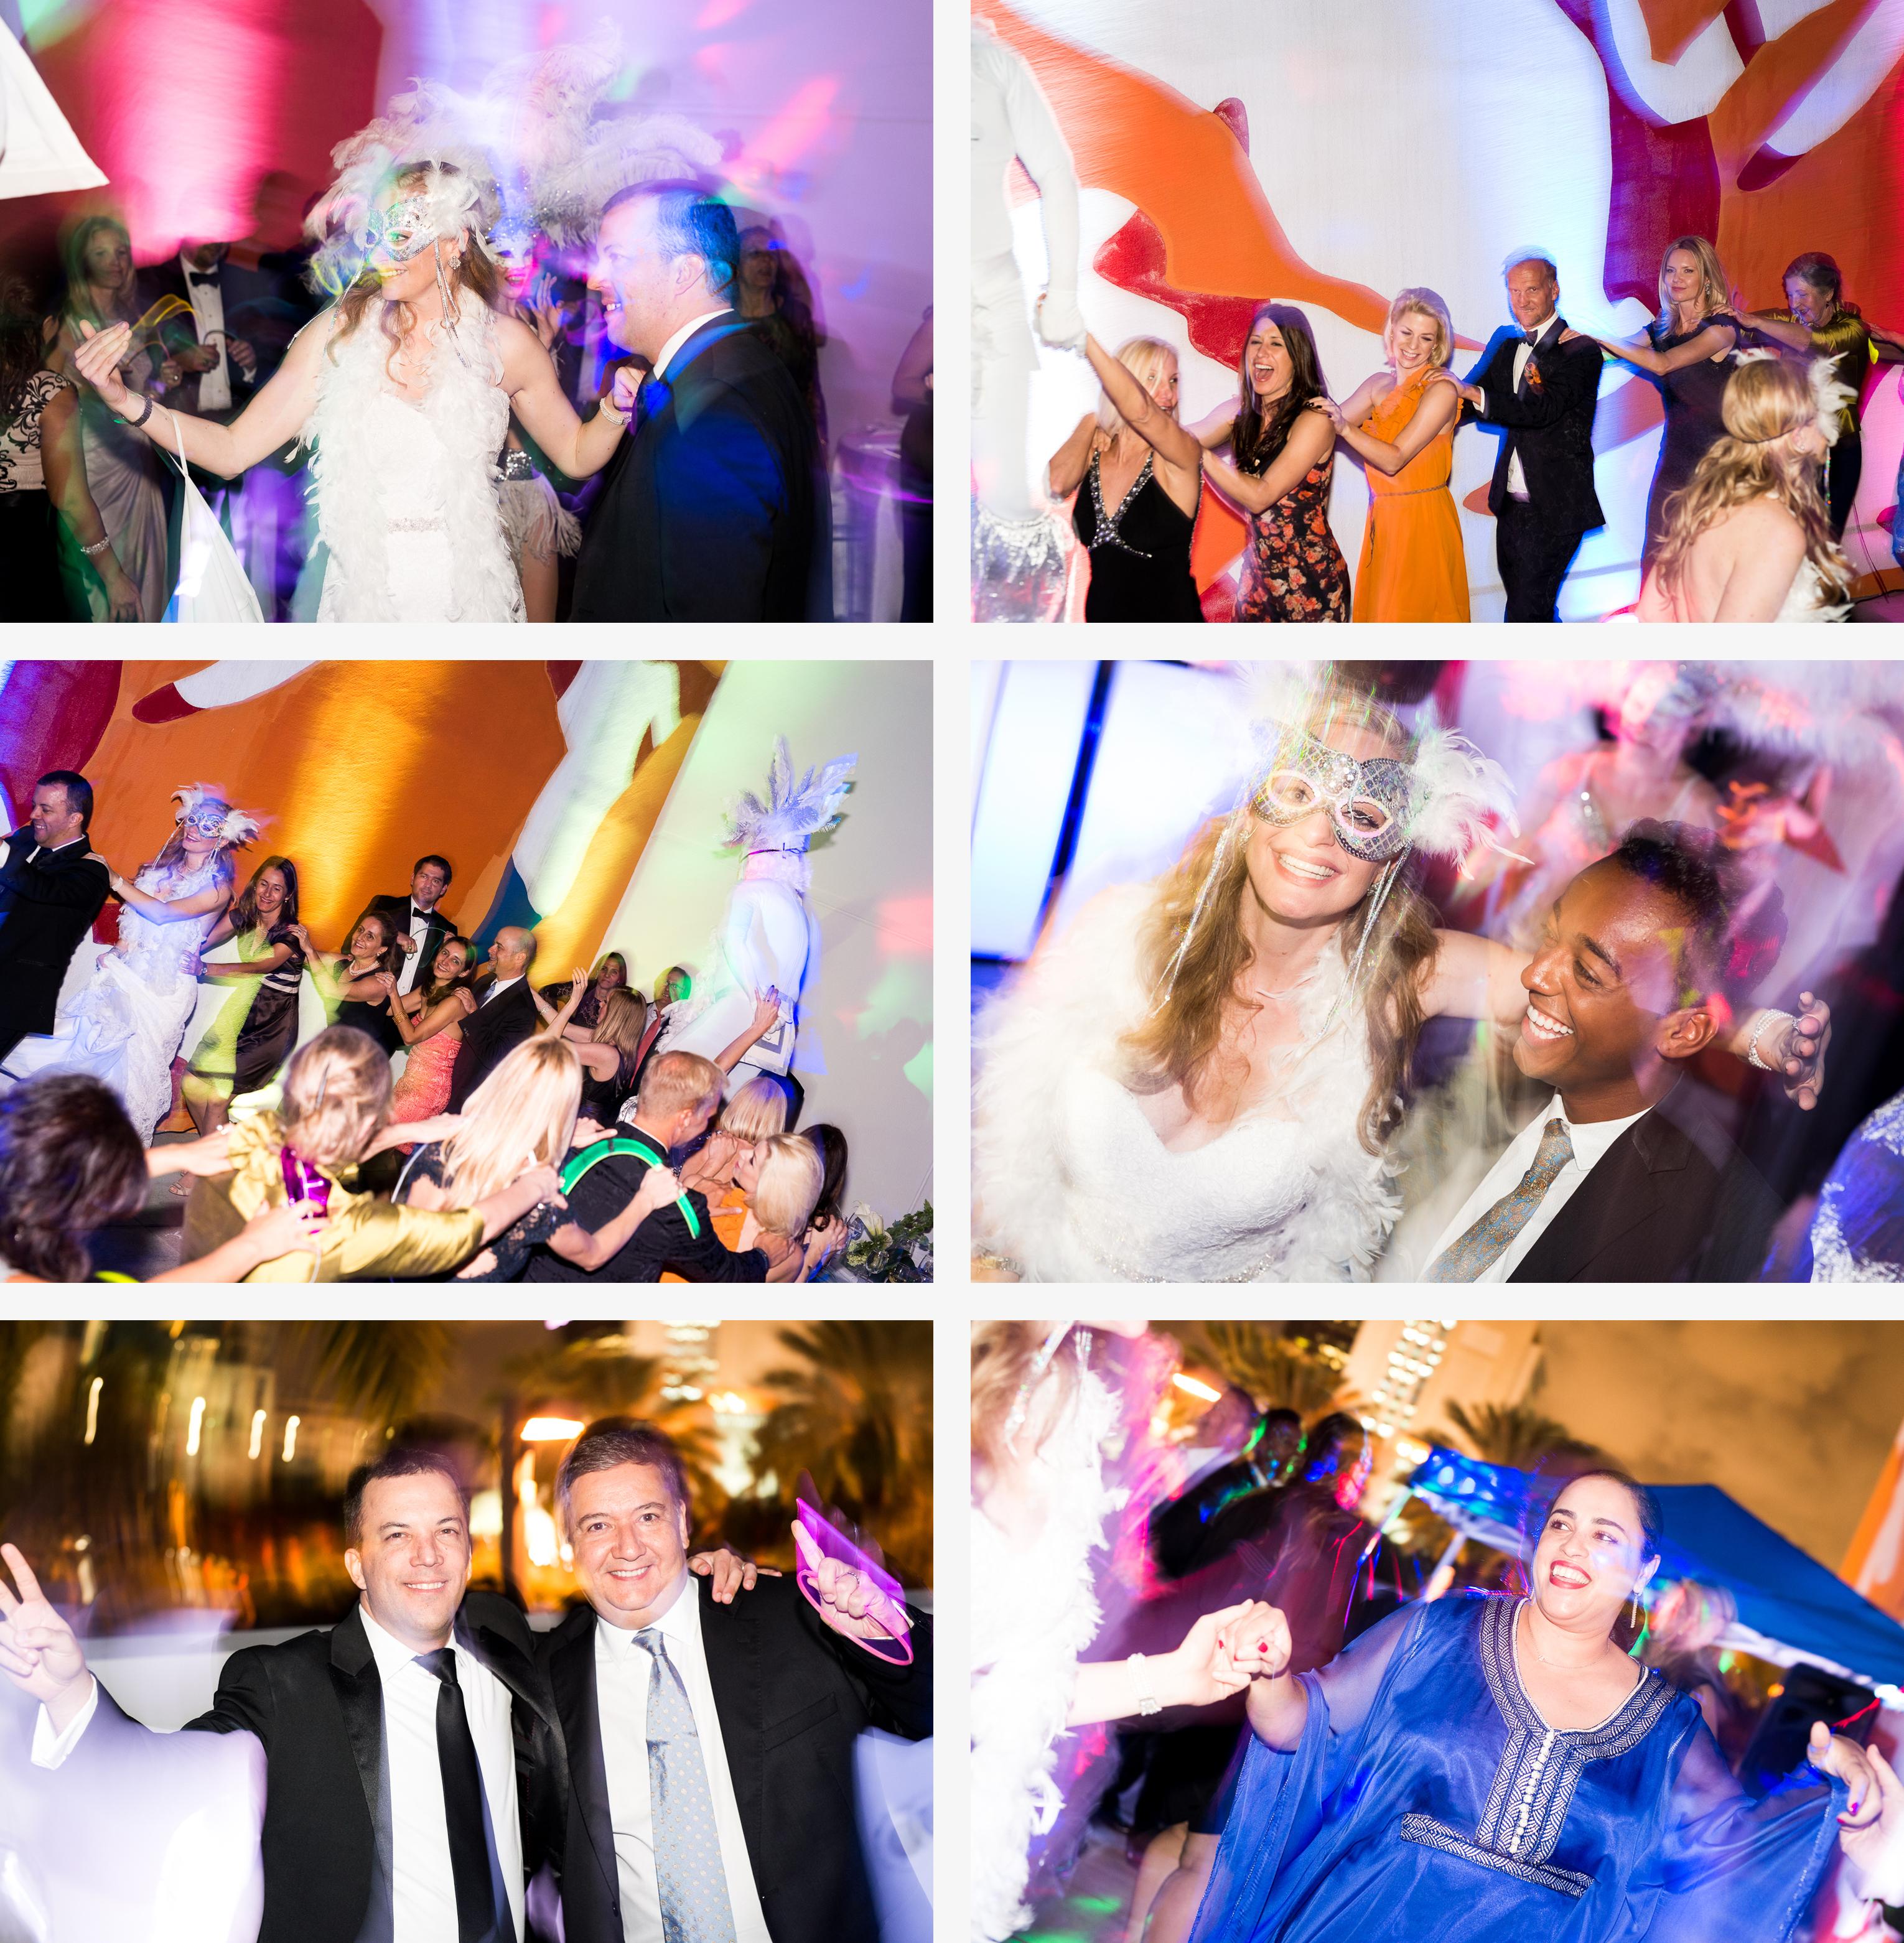 brandwold.se-miami-wedding-fortlauderdale-159